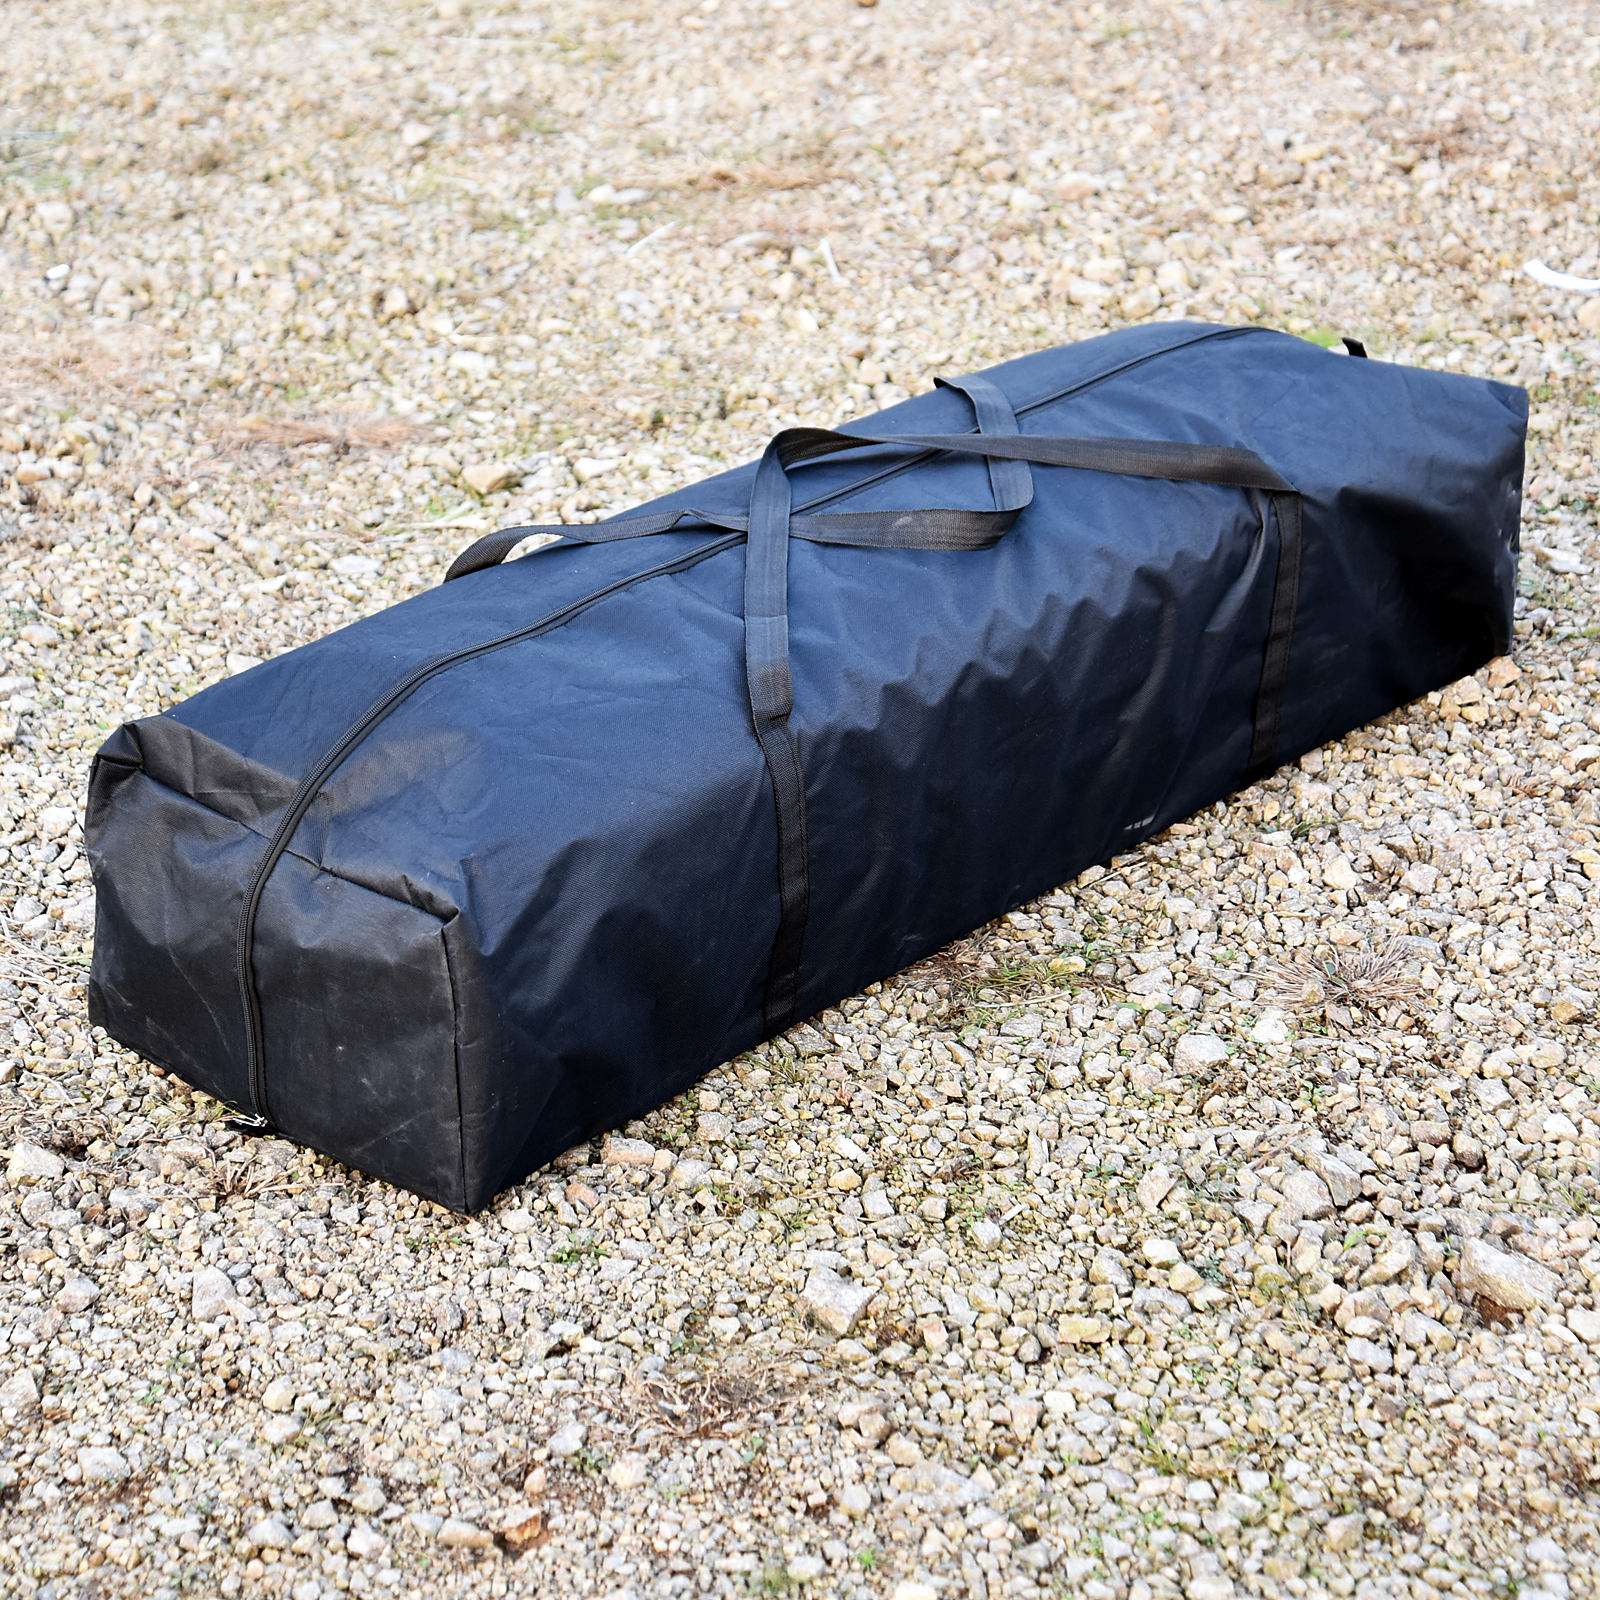 Outdoor-10-039-x20-039-EZ-POP-UP-Gazebo-Wedding-Party-Tent-Canopy-Folding-w-Carry-Bag thumbnail 27